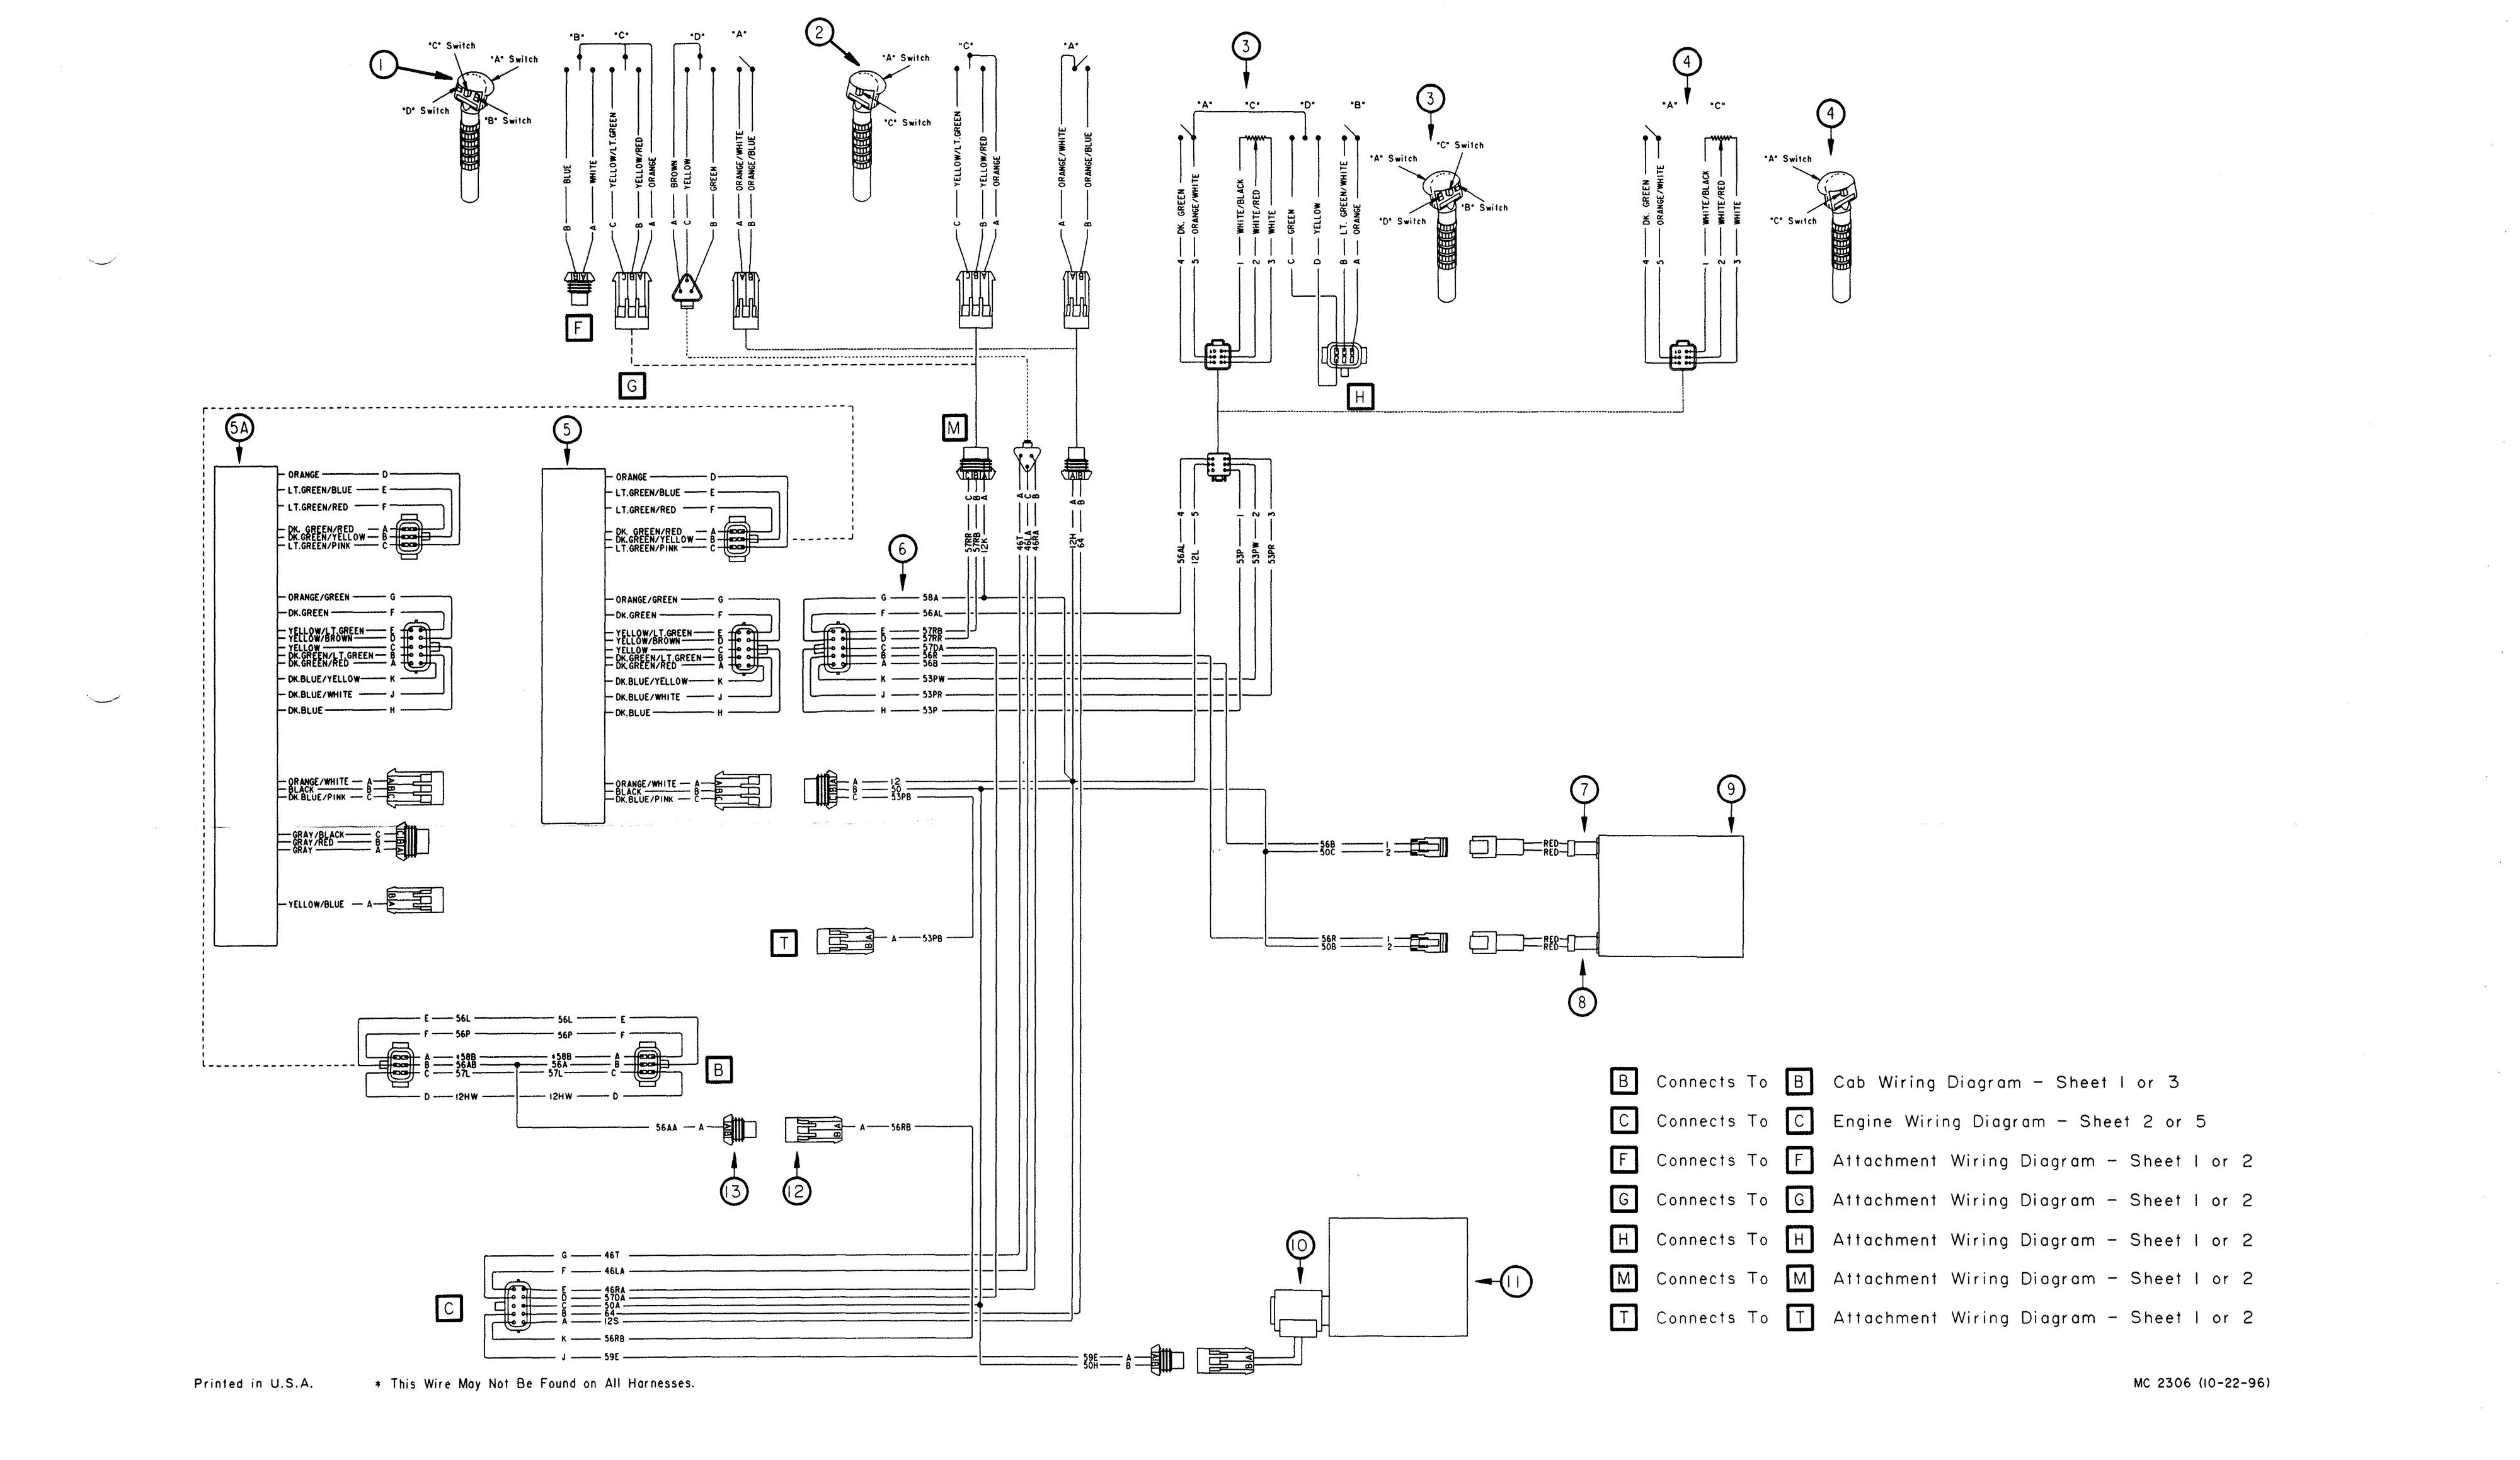 DIAGRAM] S300 Bobcat Wire Controls Diagram FULL Version HD Quality Controls  Diagram - AVCU118SCHEMATIC283.RESTAURANTLERELAISFLEURI.FR avcu118schematic283.restaurantlerelaisfleuri.fr